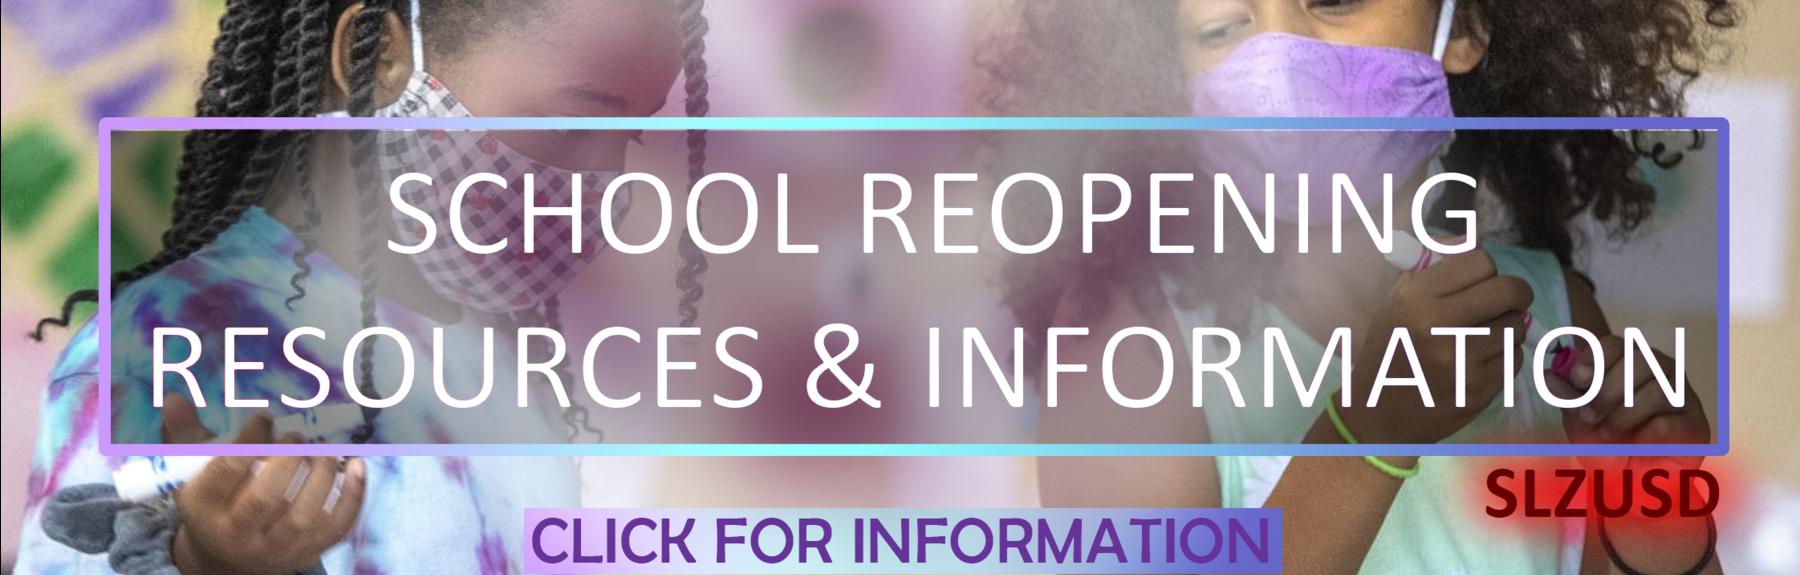 School Reopening Resources & Information